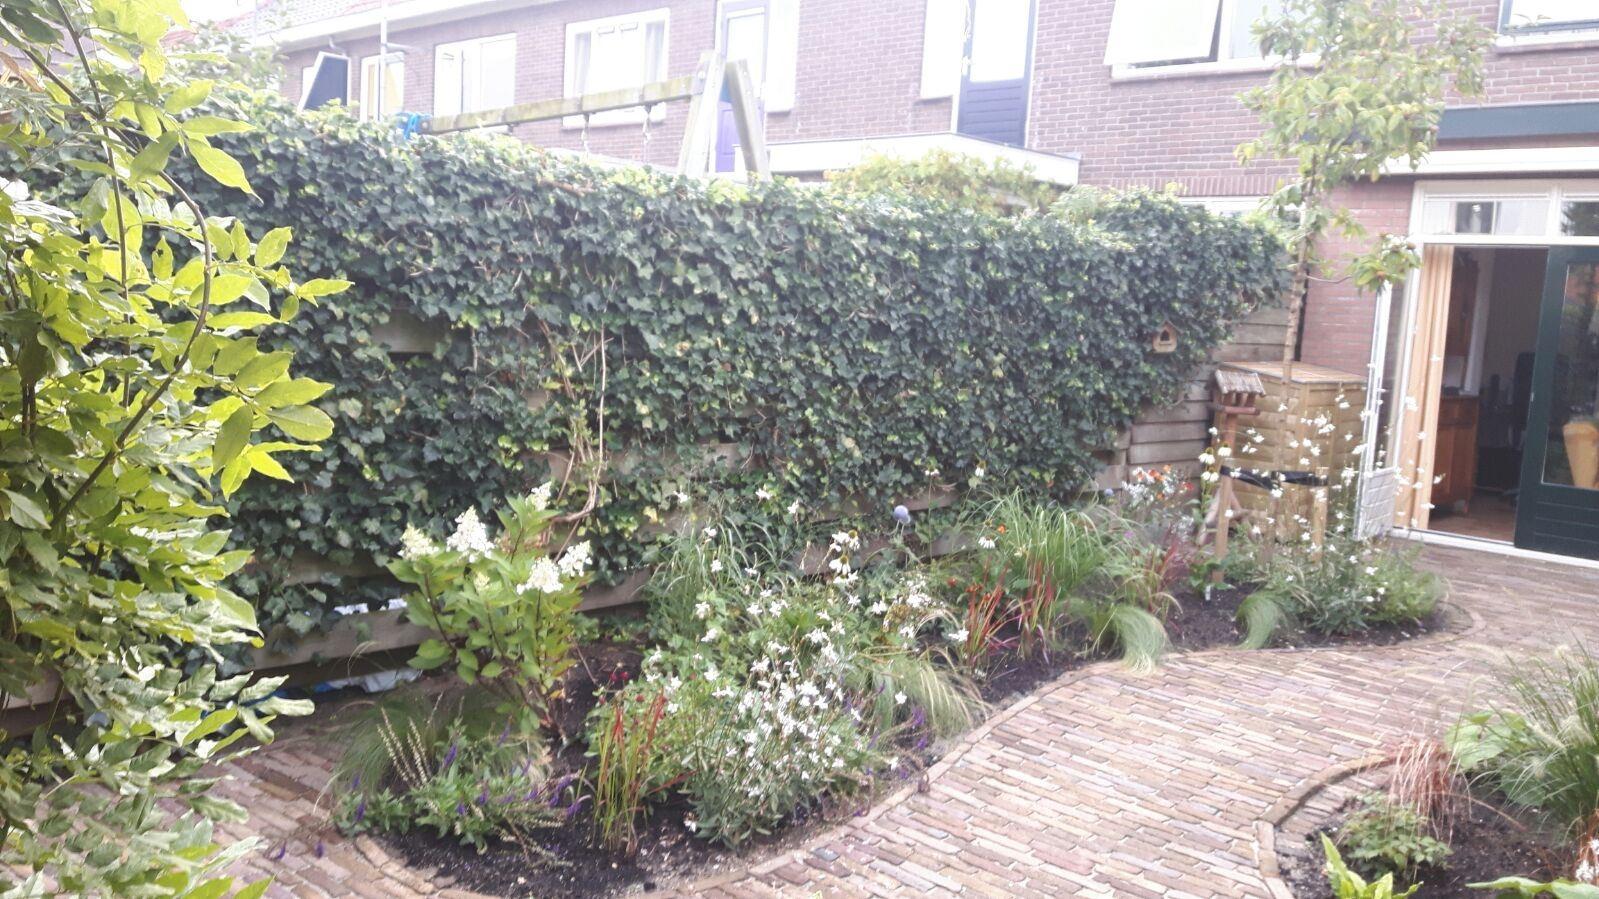 Hoveniersbedrijf Isidorus Hoeve Engelse stijl kleine tuin